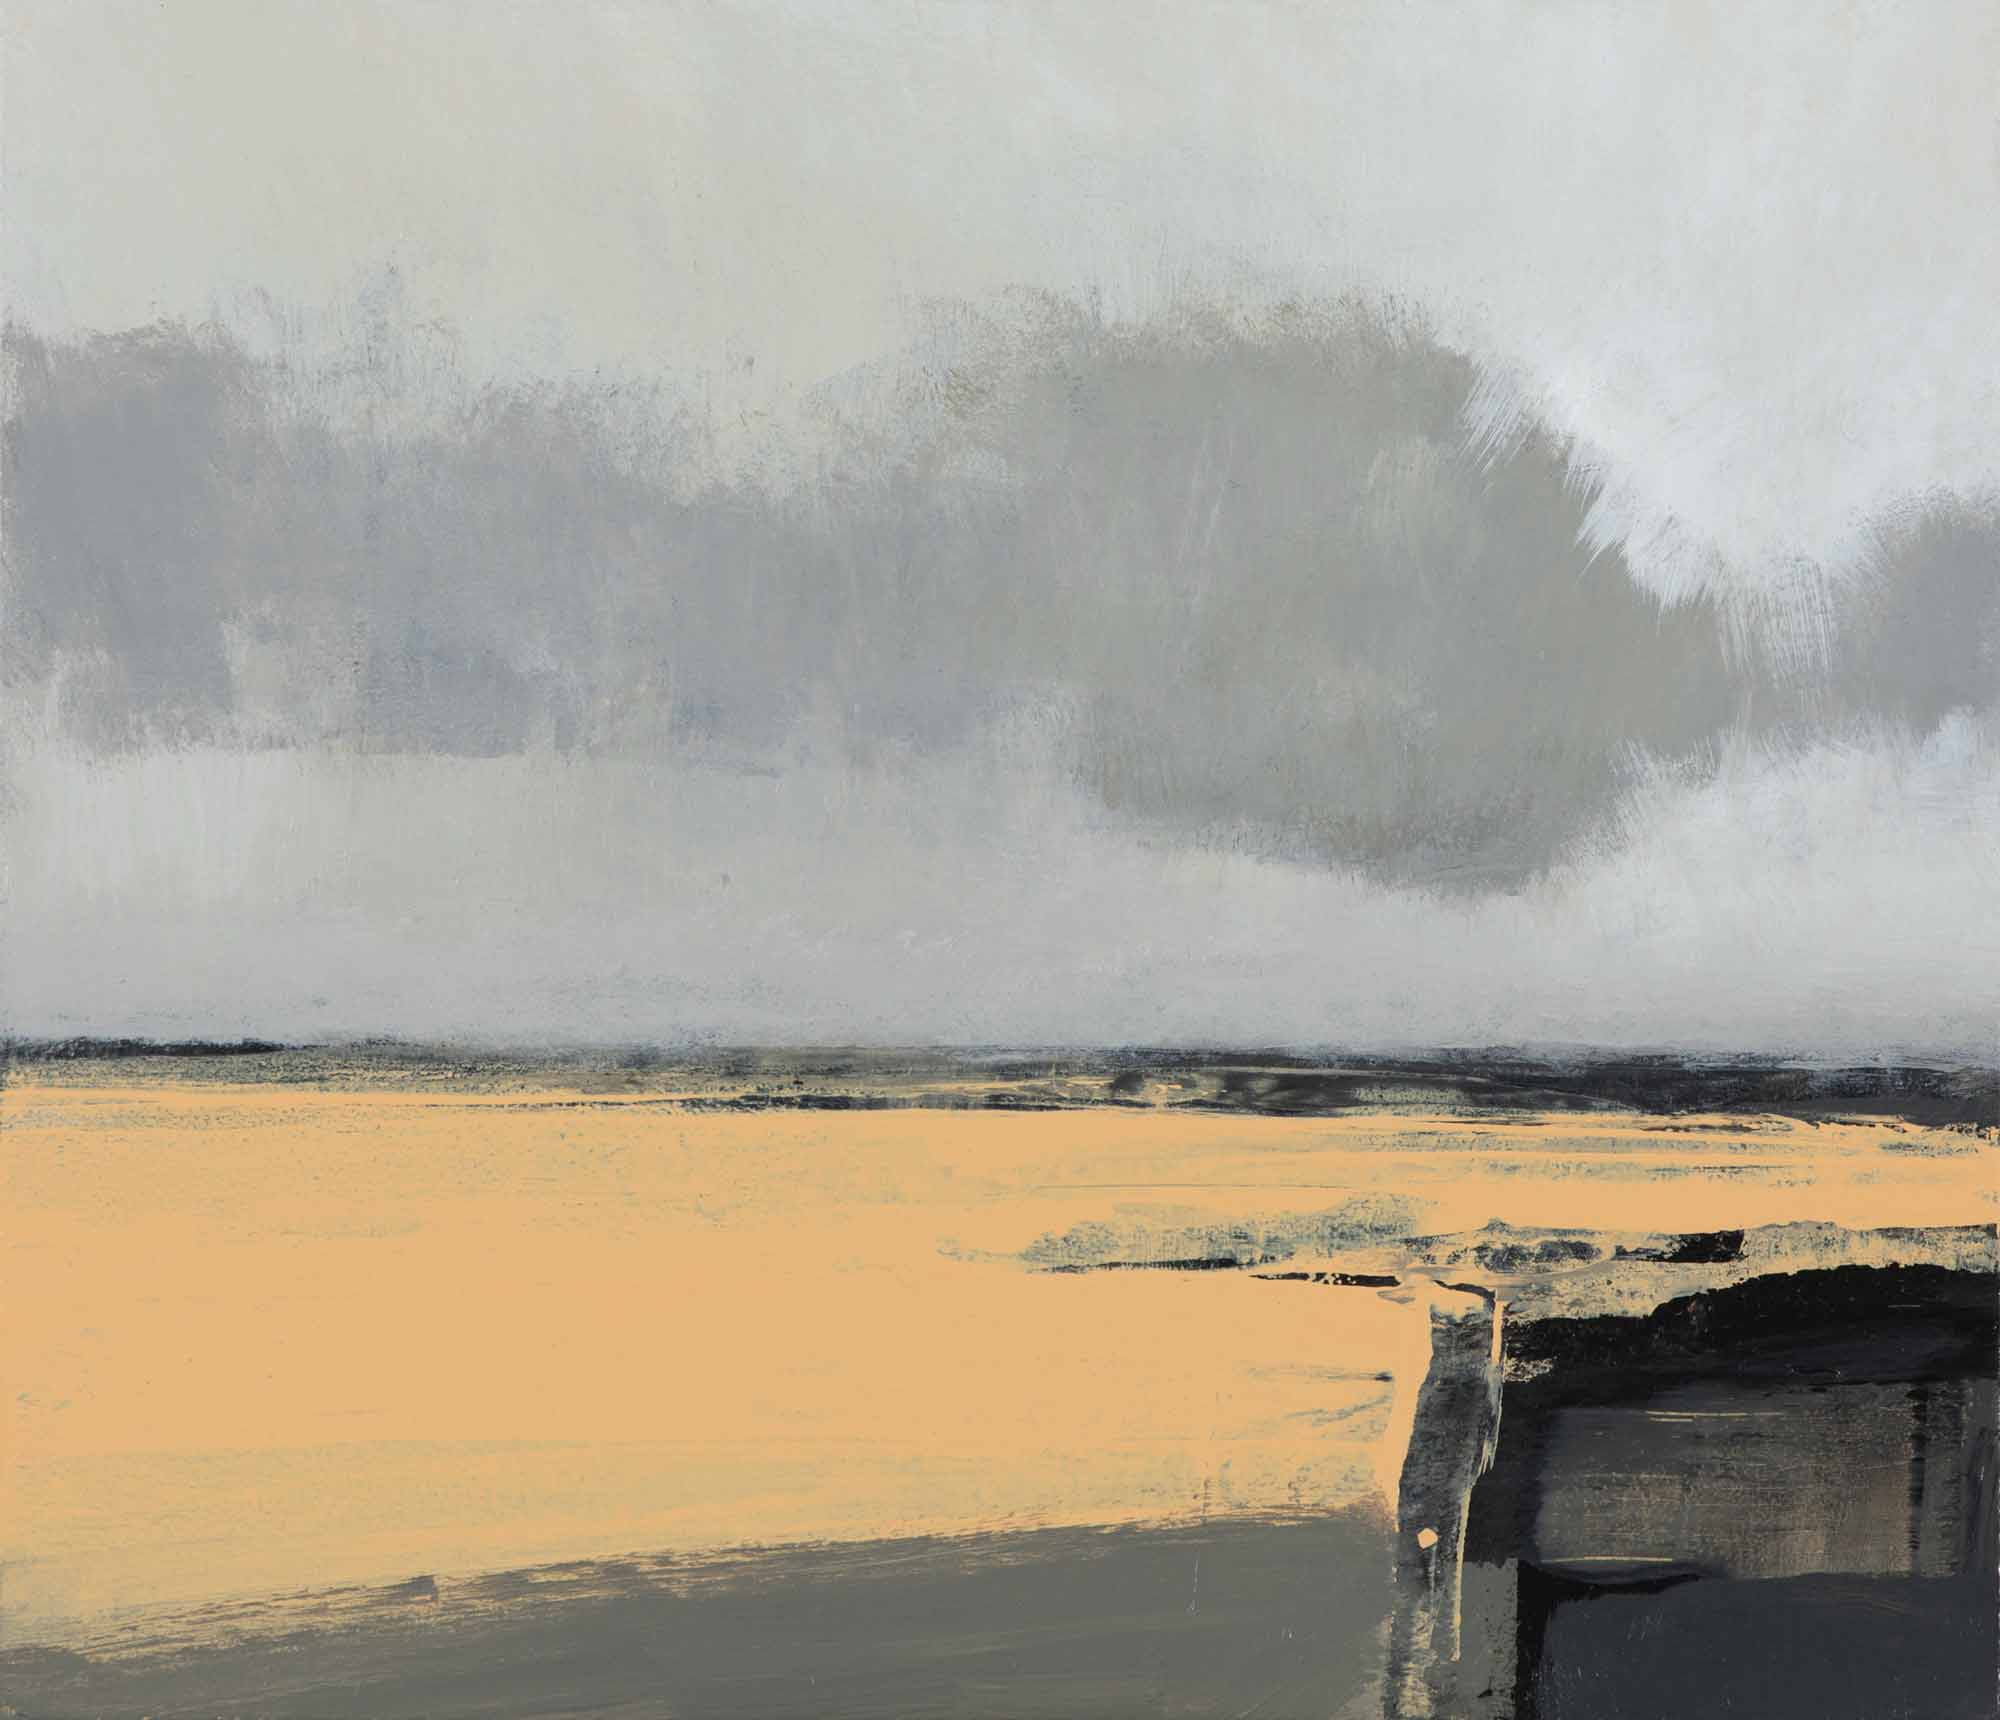 http://neilcanning.com/wp-content/uploads/sites/3/2017/03/18-Landform-Fields.jpg